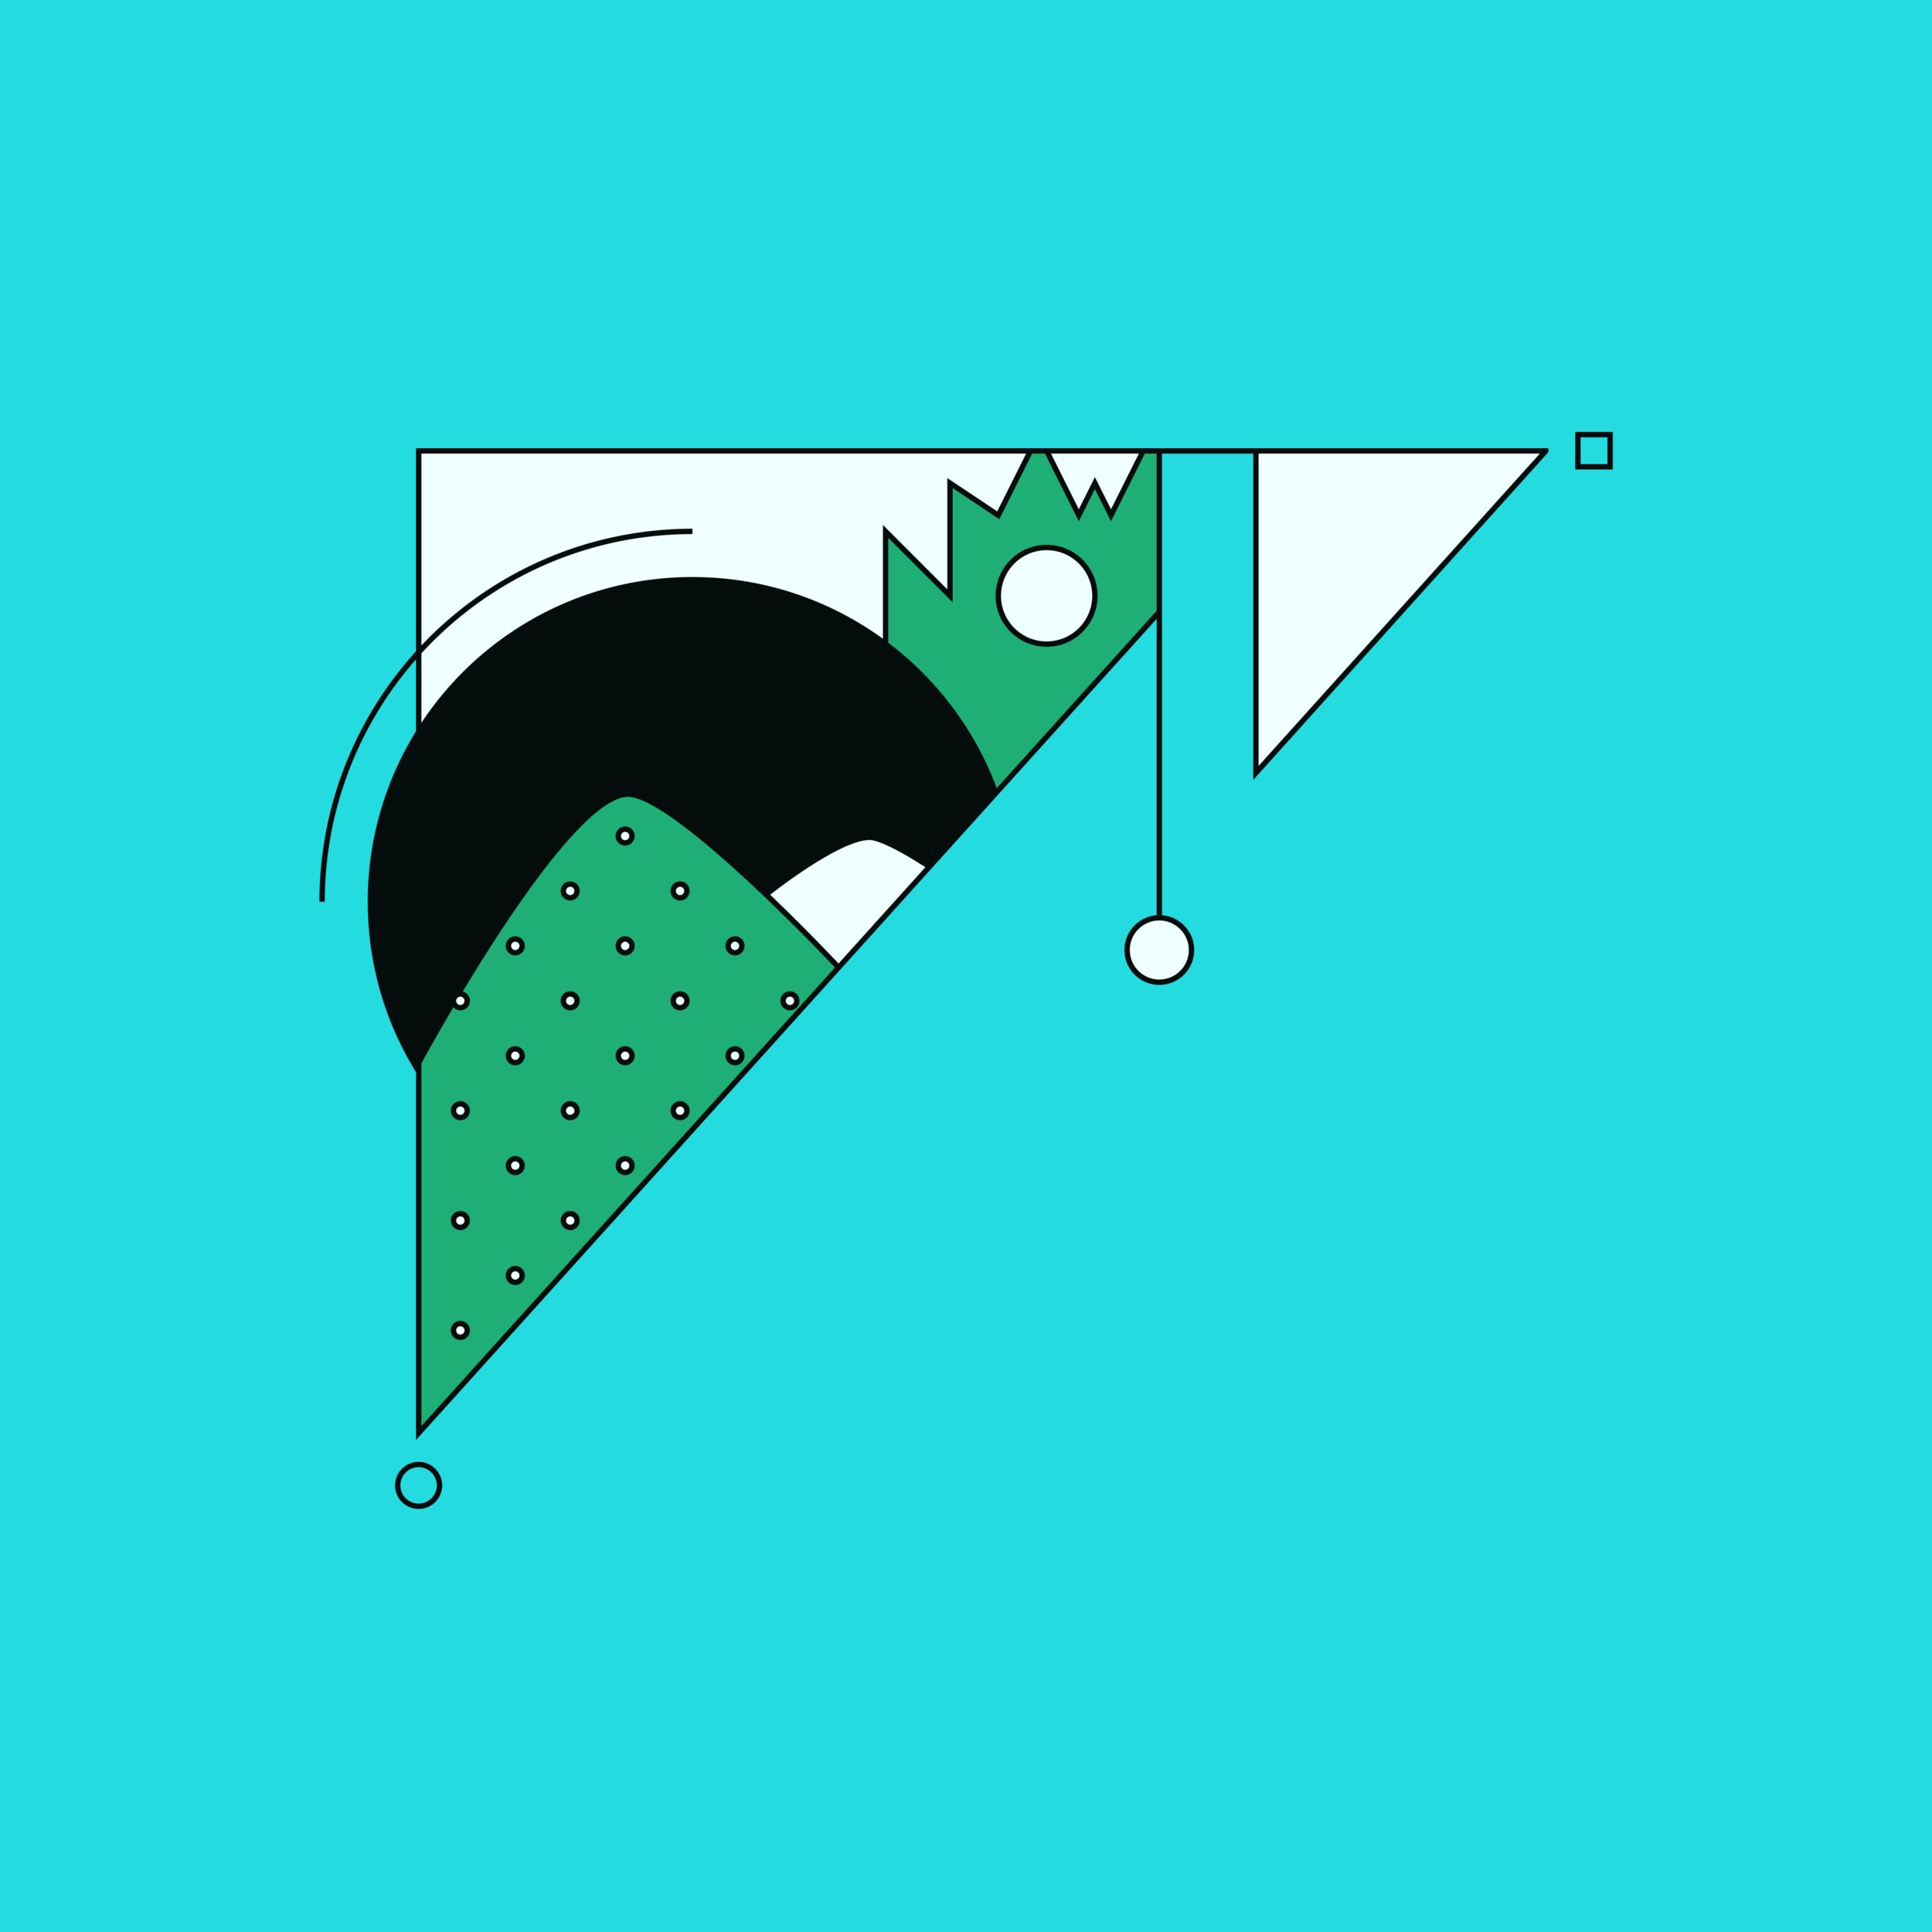 TriangleWindow_190419.png